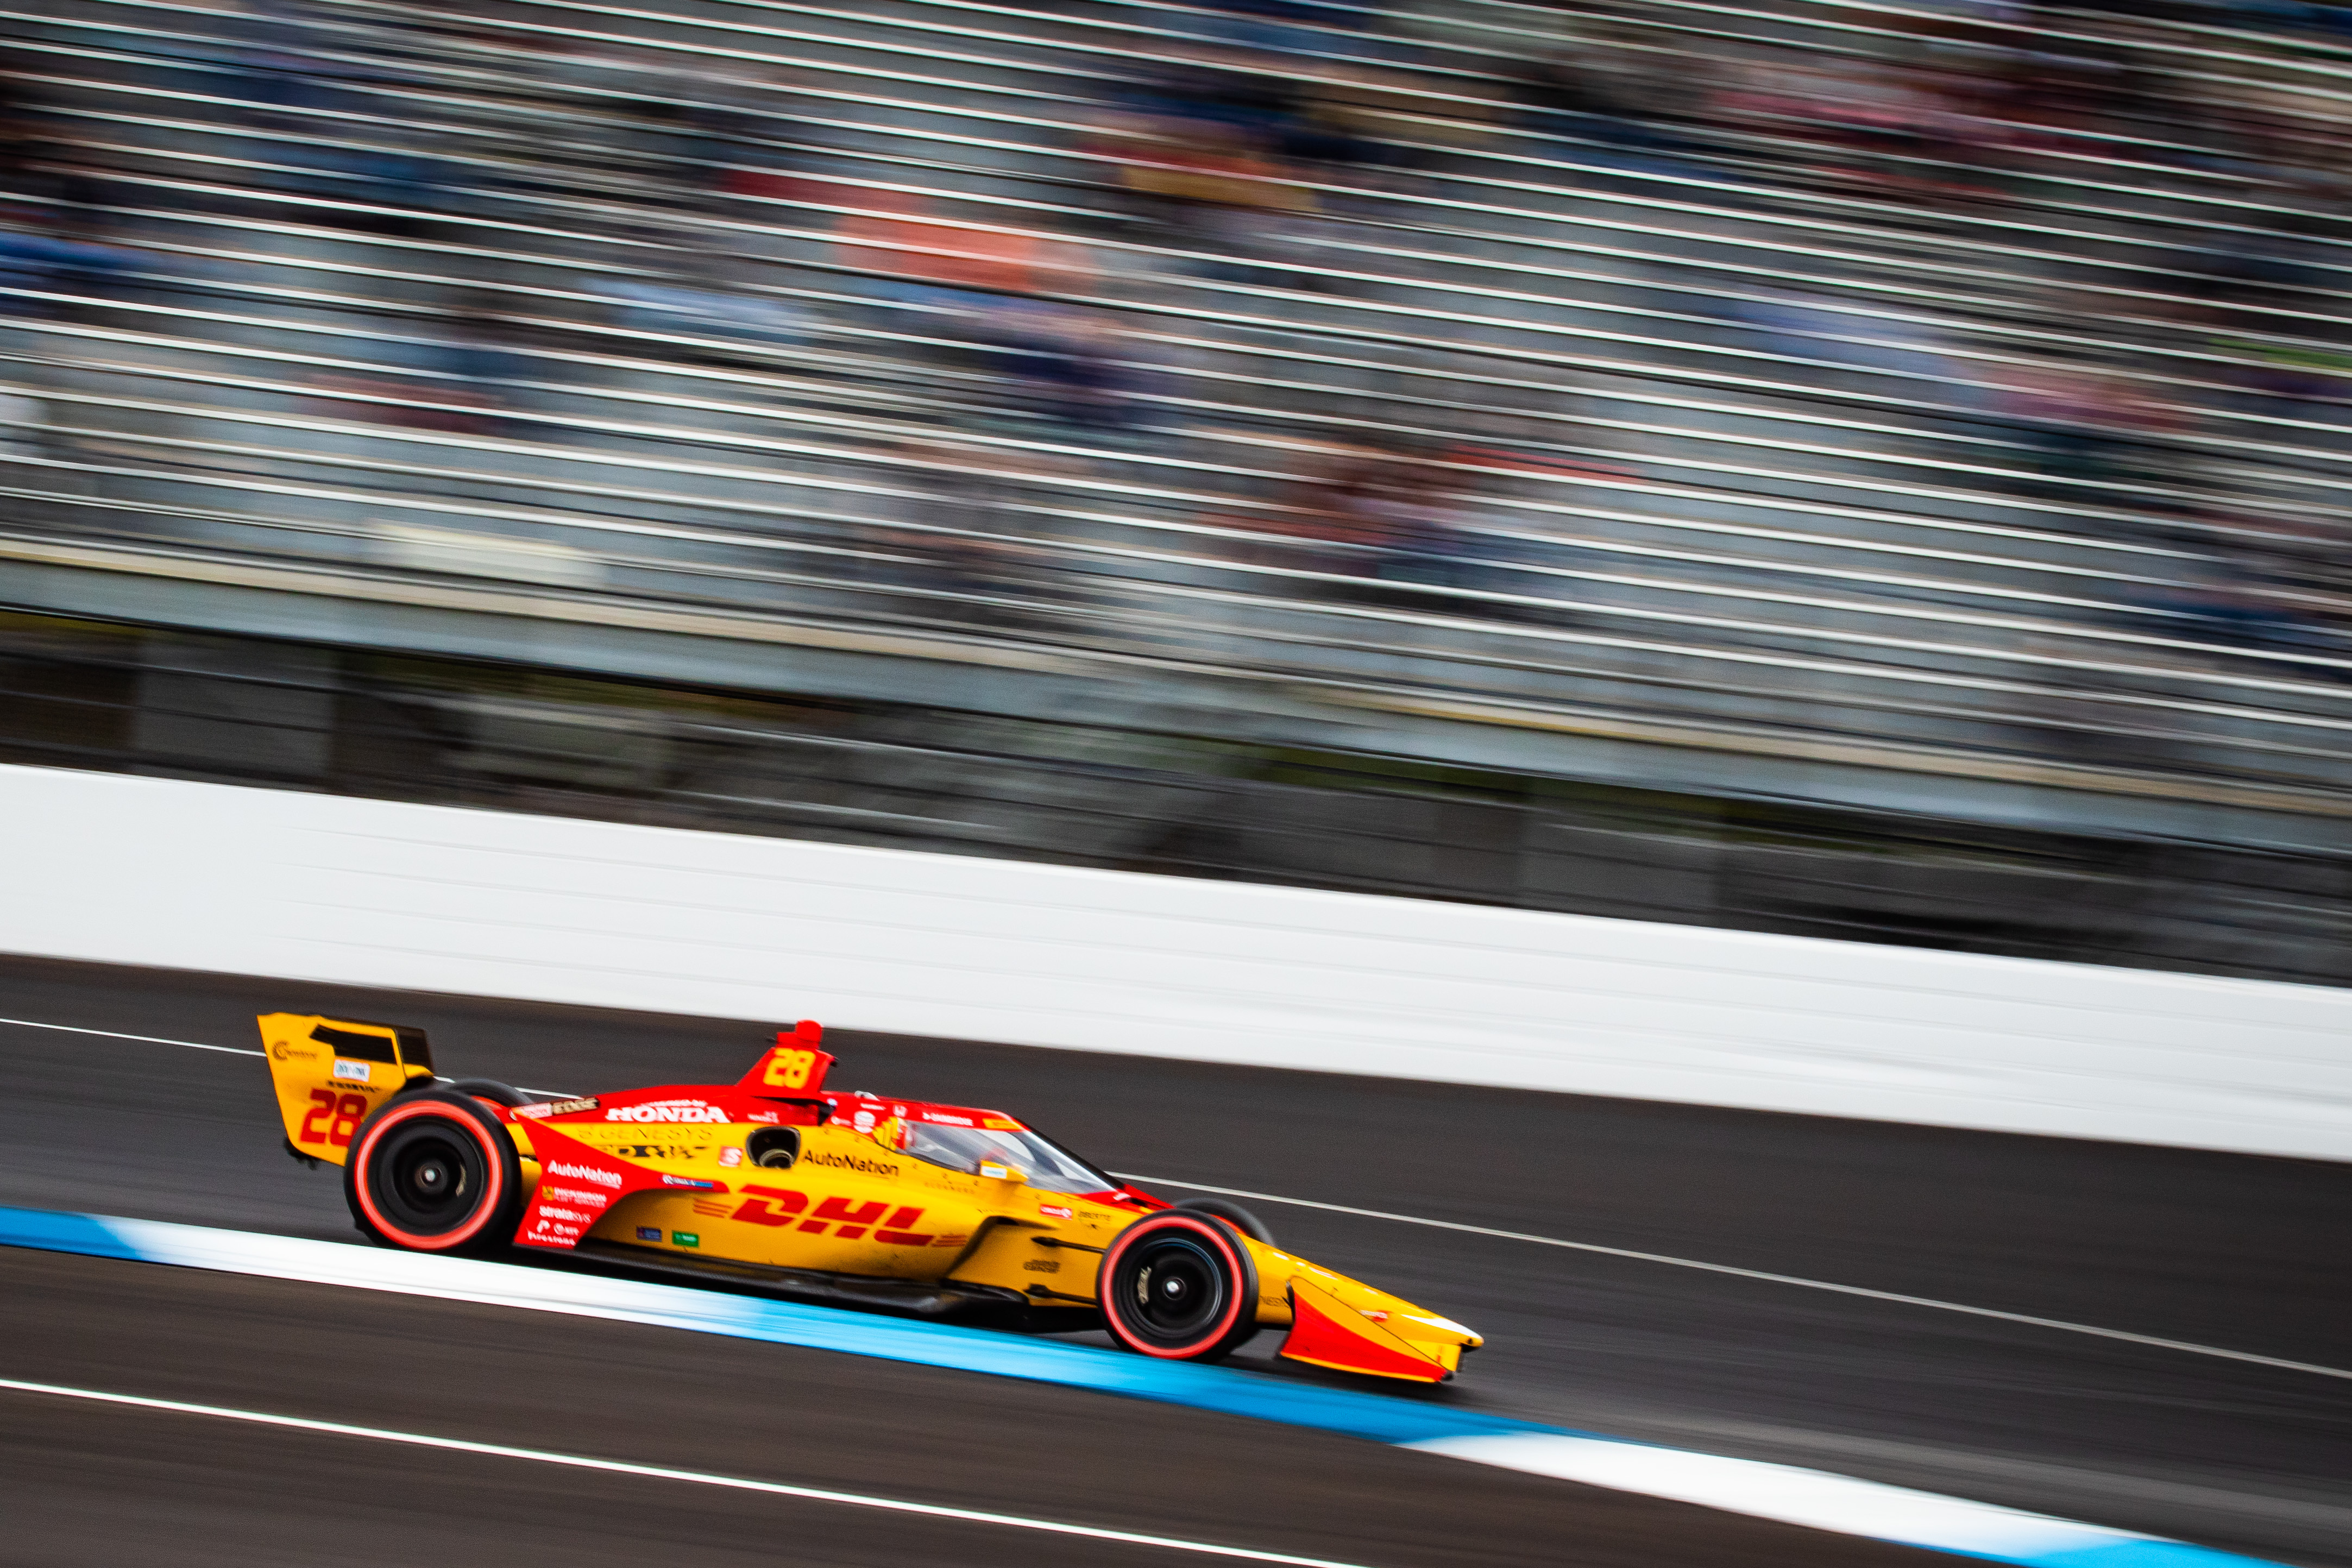 Ntt Indycar Series Indycar Harvest Gp Race 1